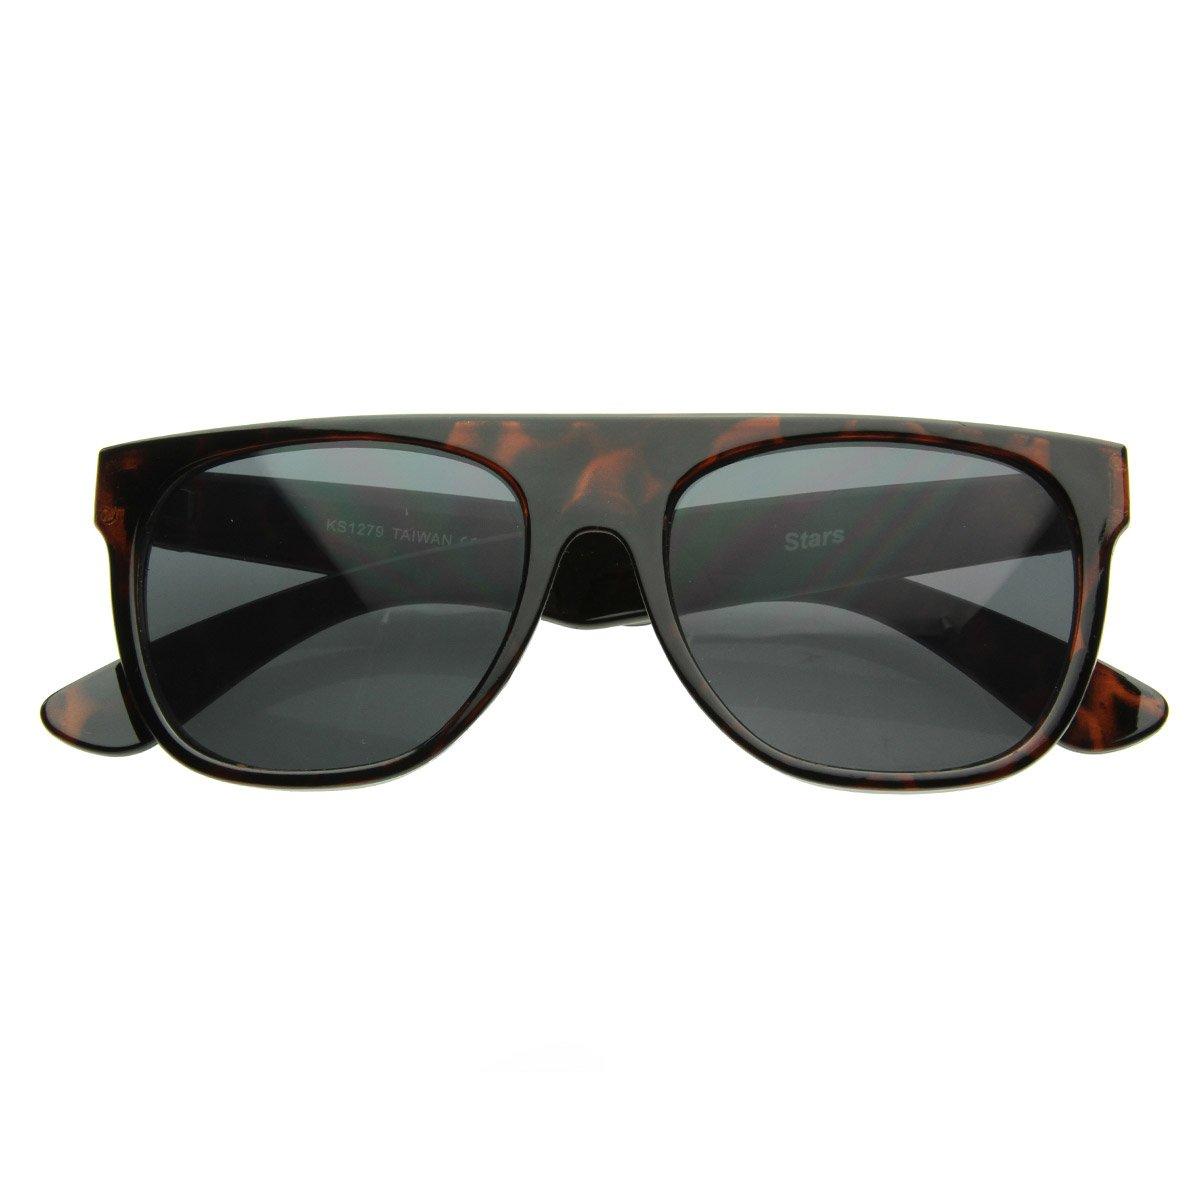 Modern Retro Flat-Top Aviator Style Sunglasses Super Flat Clean Shades (Tortoise Shell)